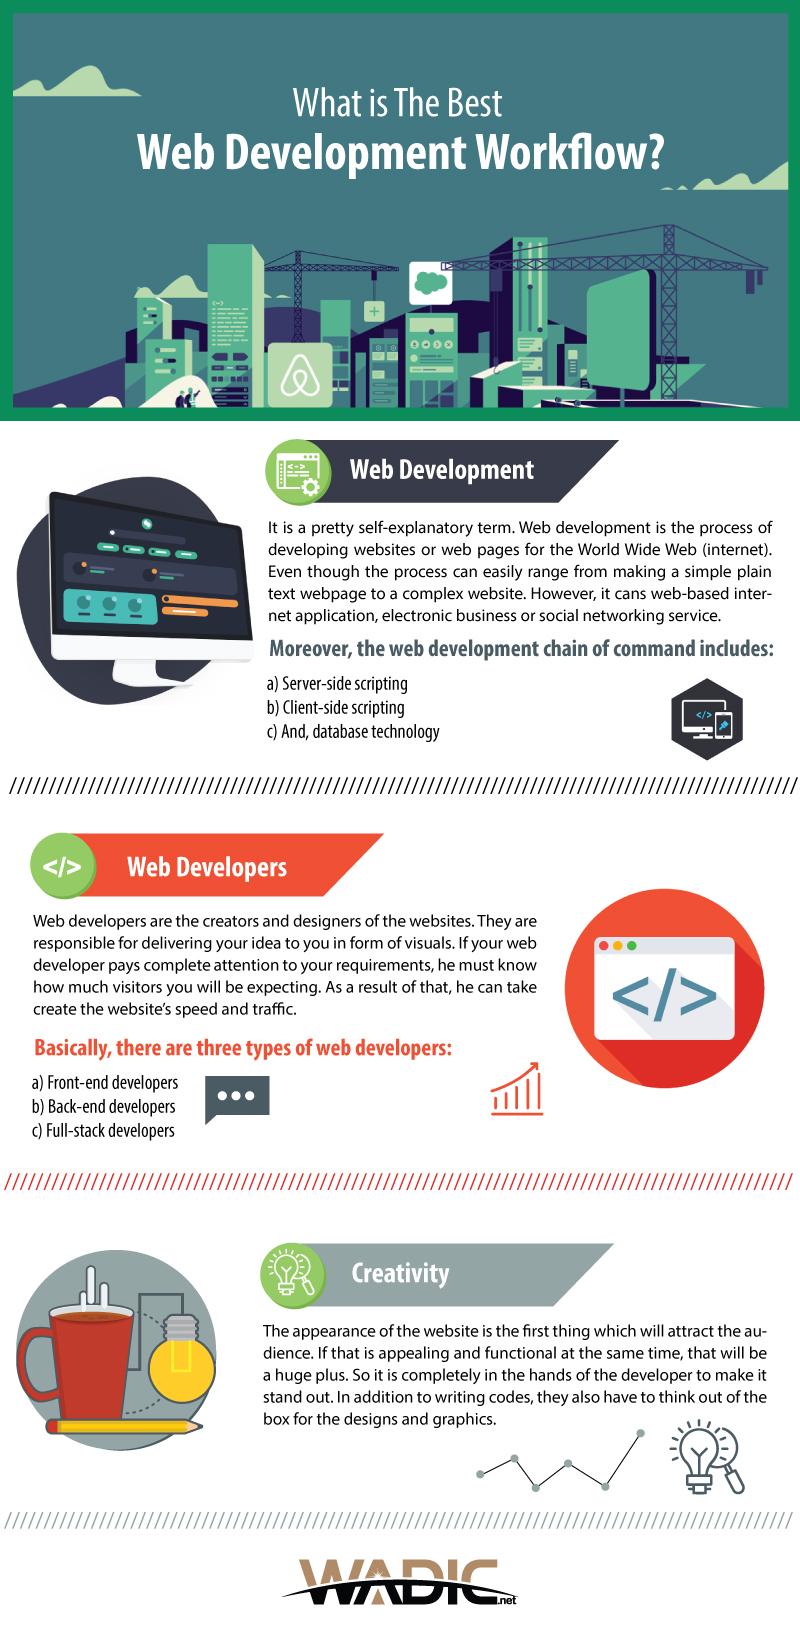 Best Web Development Workflow